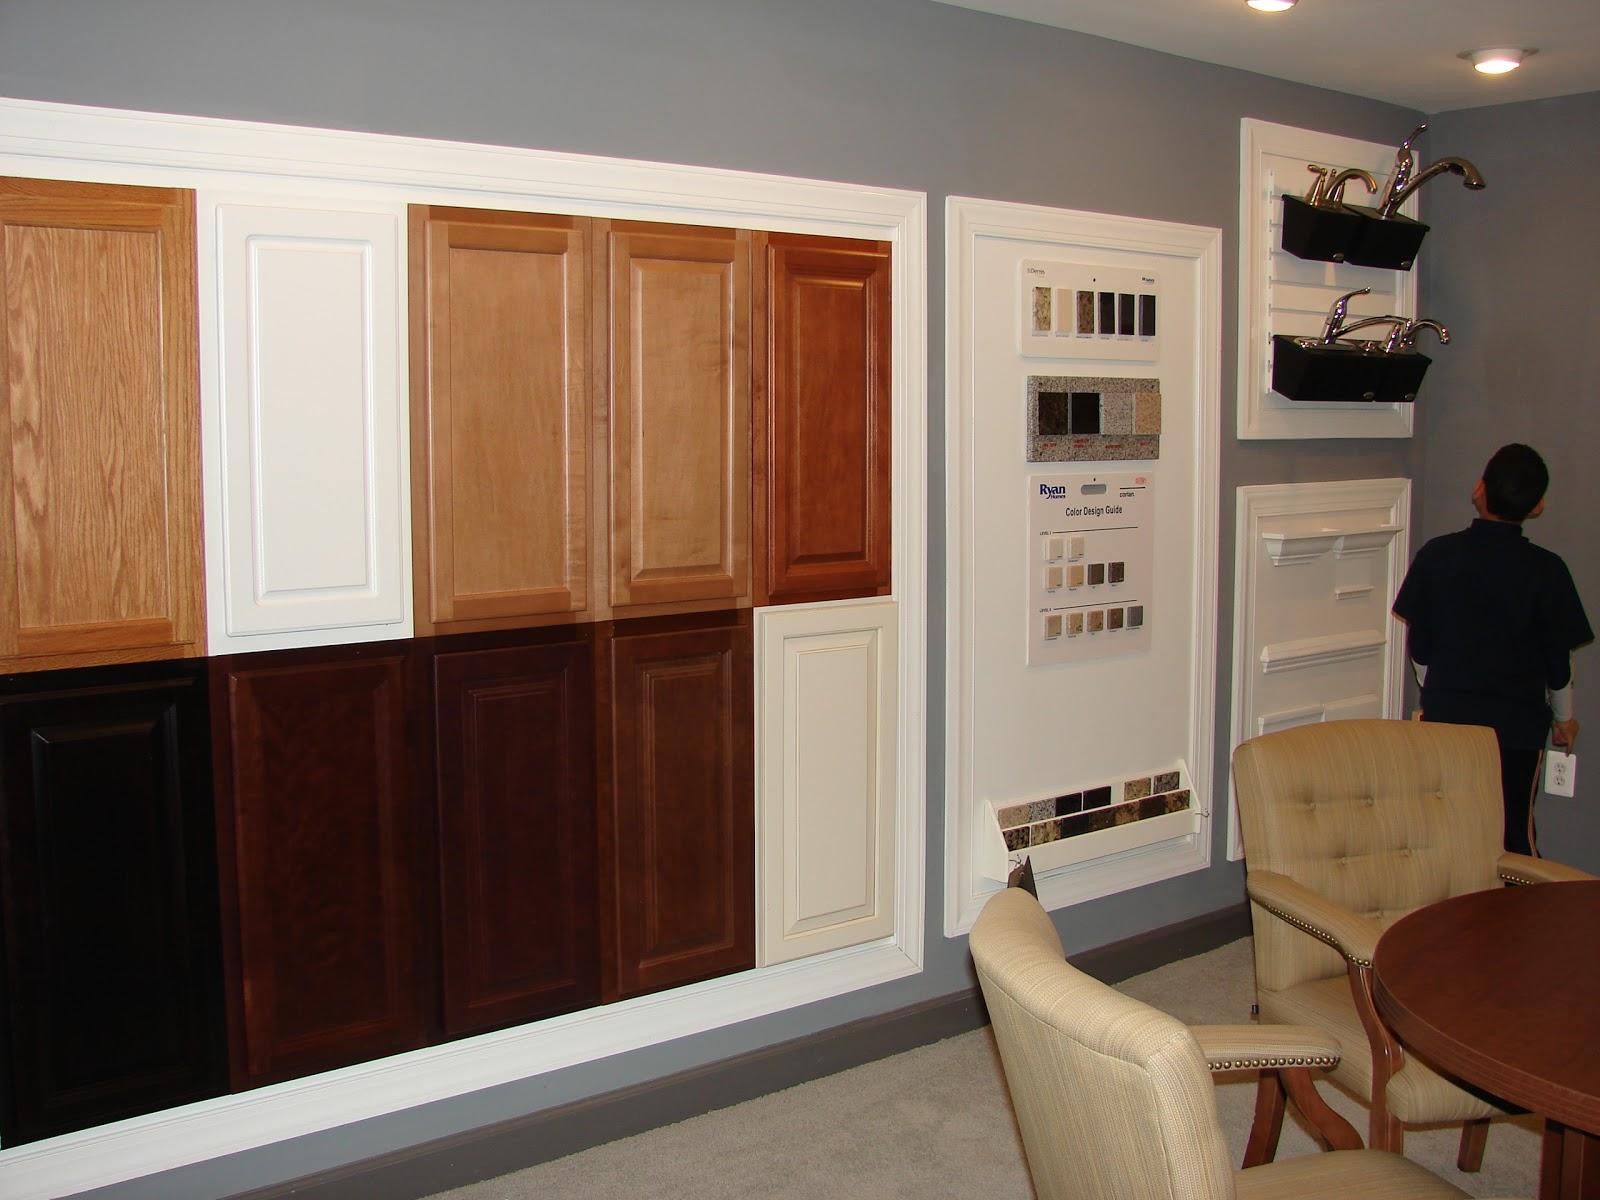 Building A Ryan Home Avalon Cabinet Choices Beware